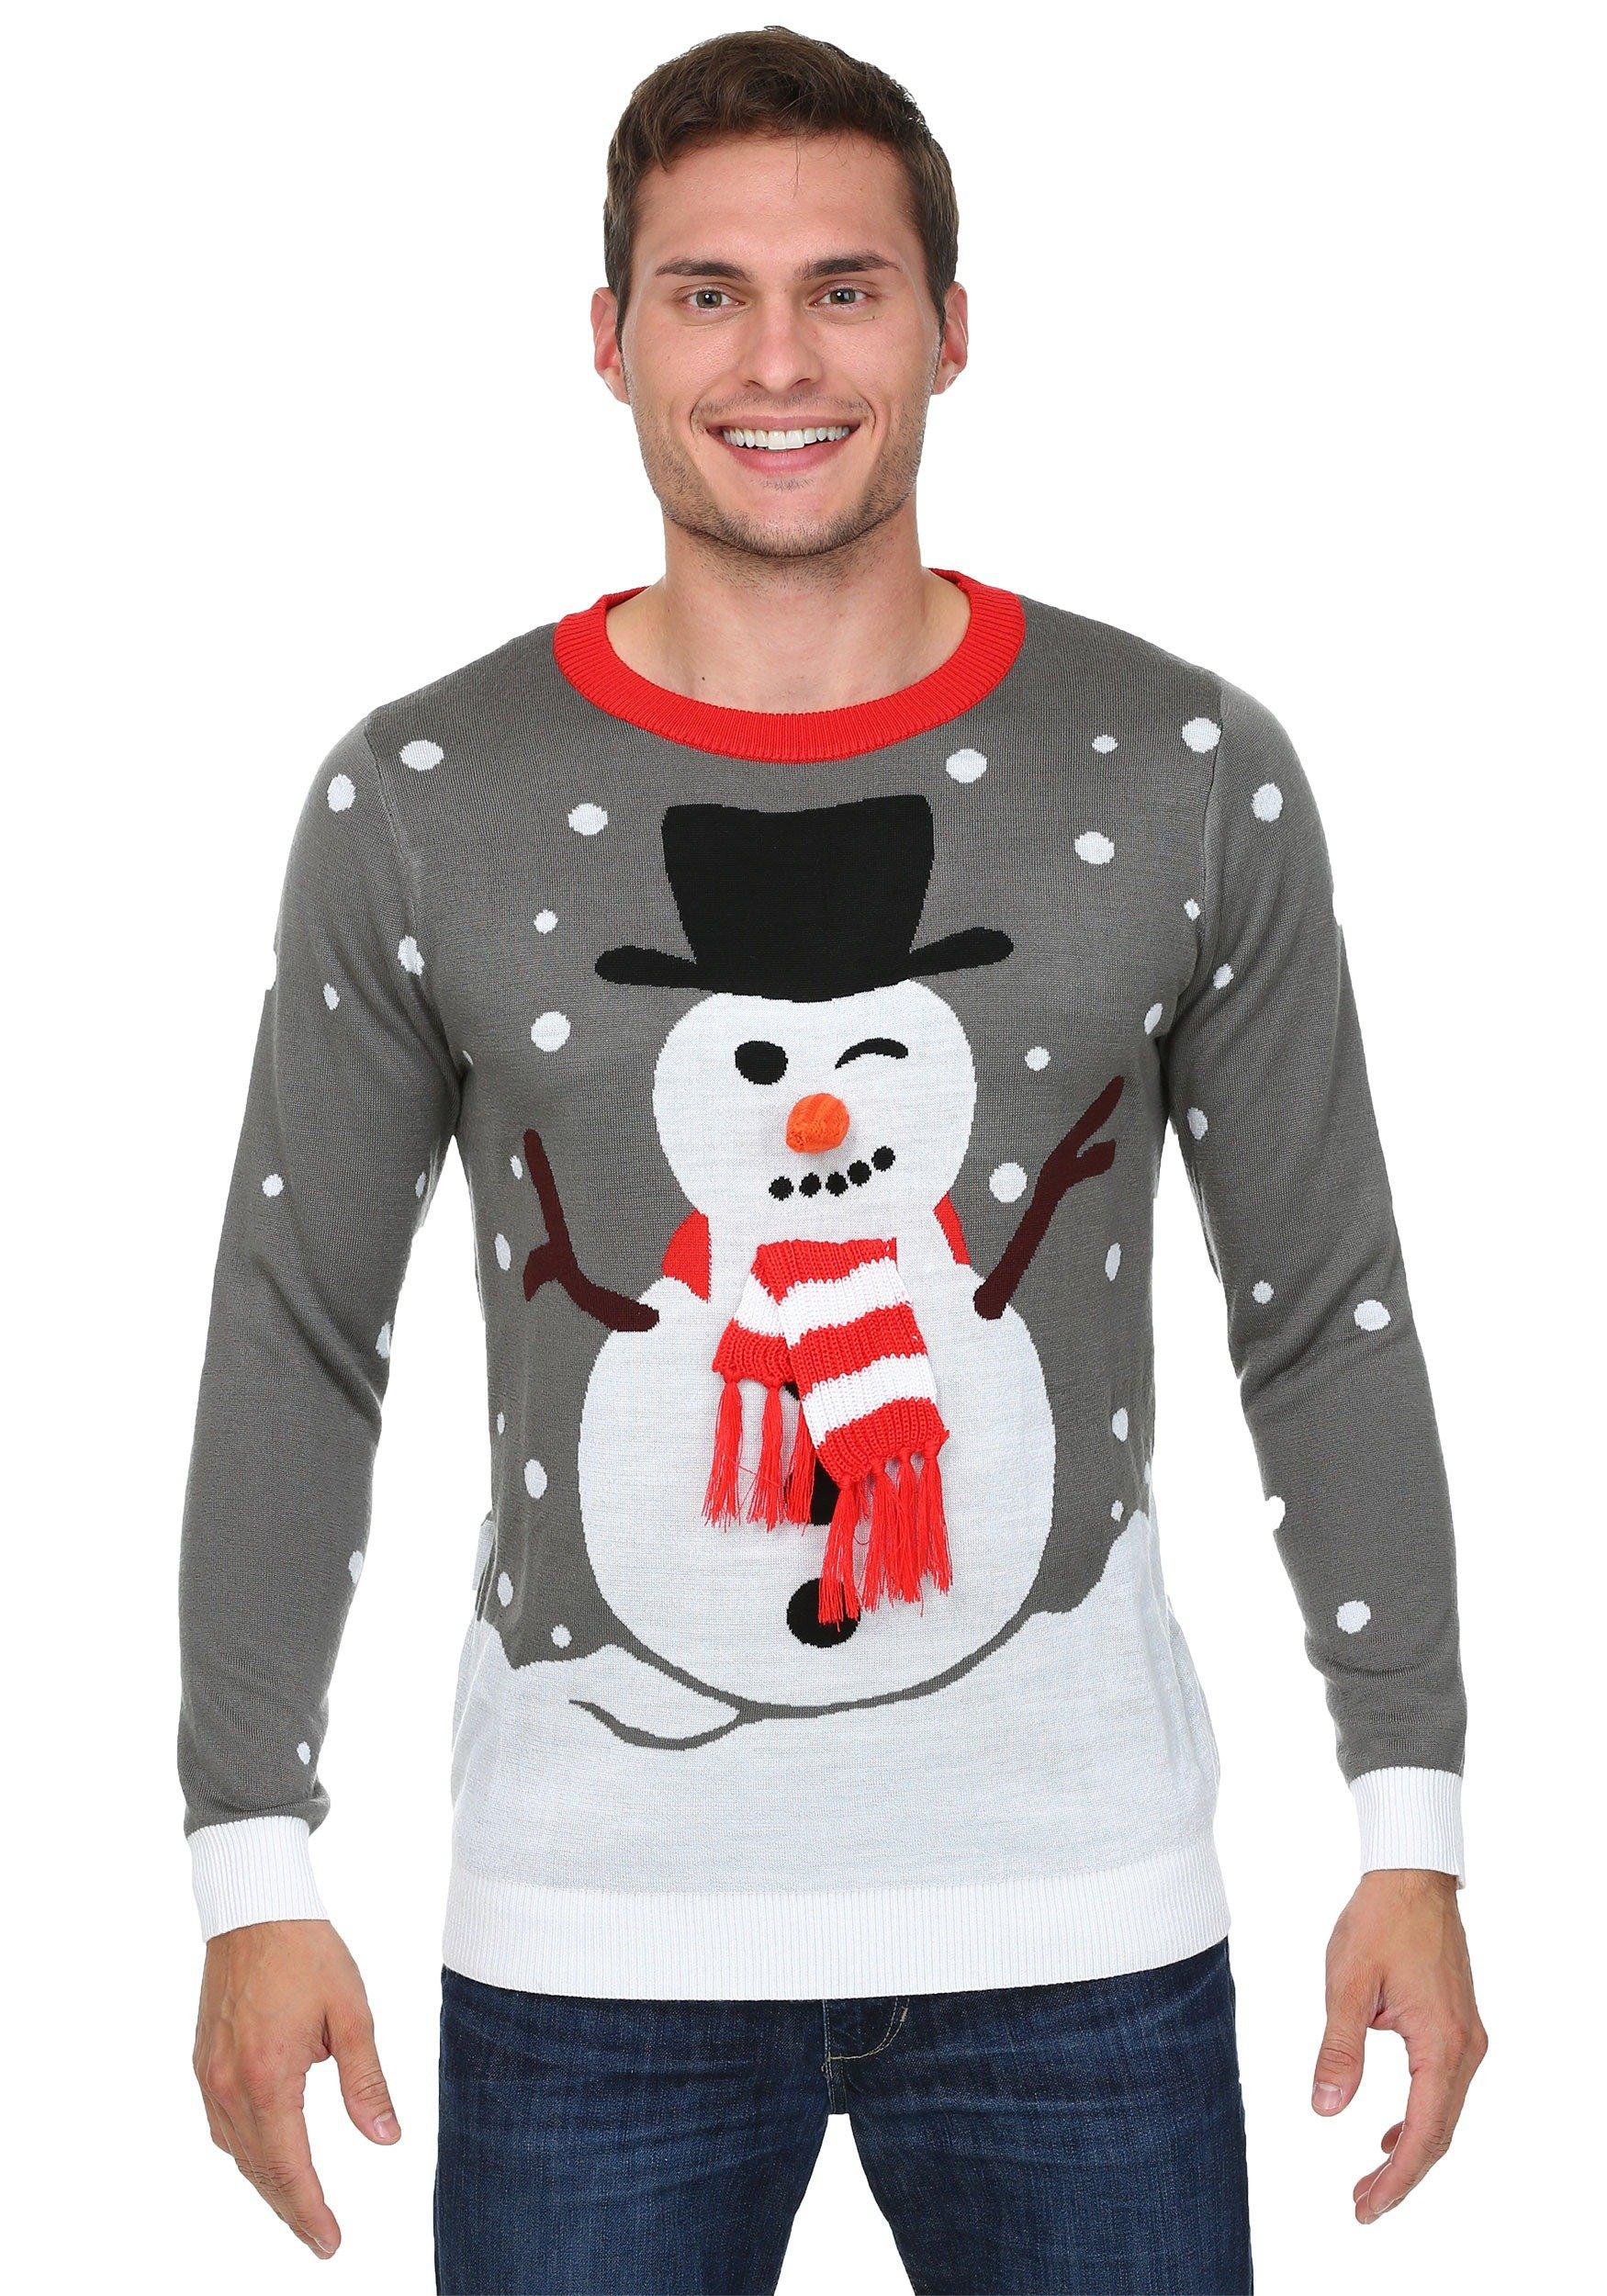 Cheap Snowman Christmas Sweater, find Snowman Christmas Sweater ...